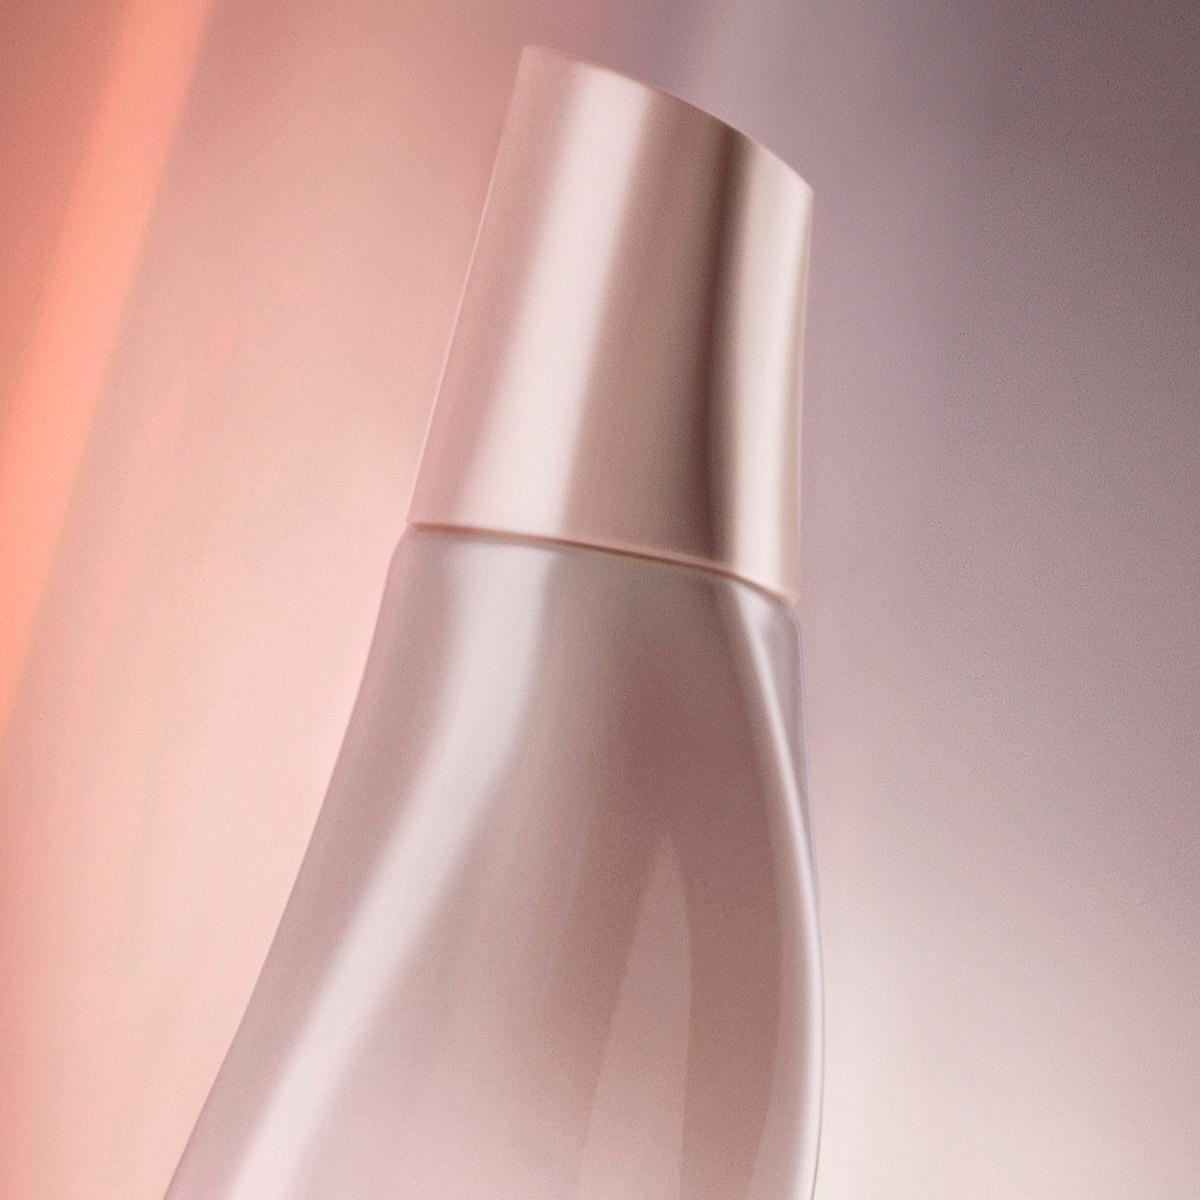 Desodorante Colônia Luna Floral - 75ml - 60006